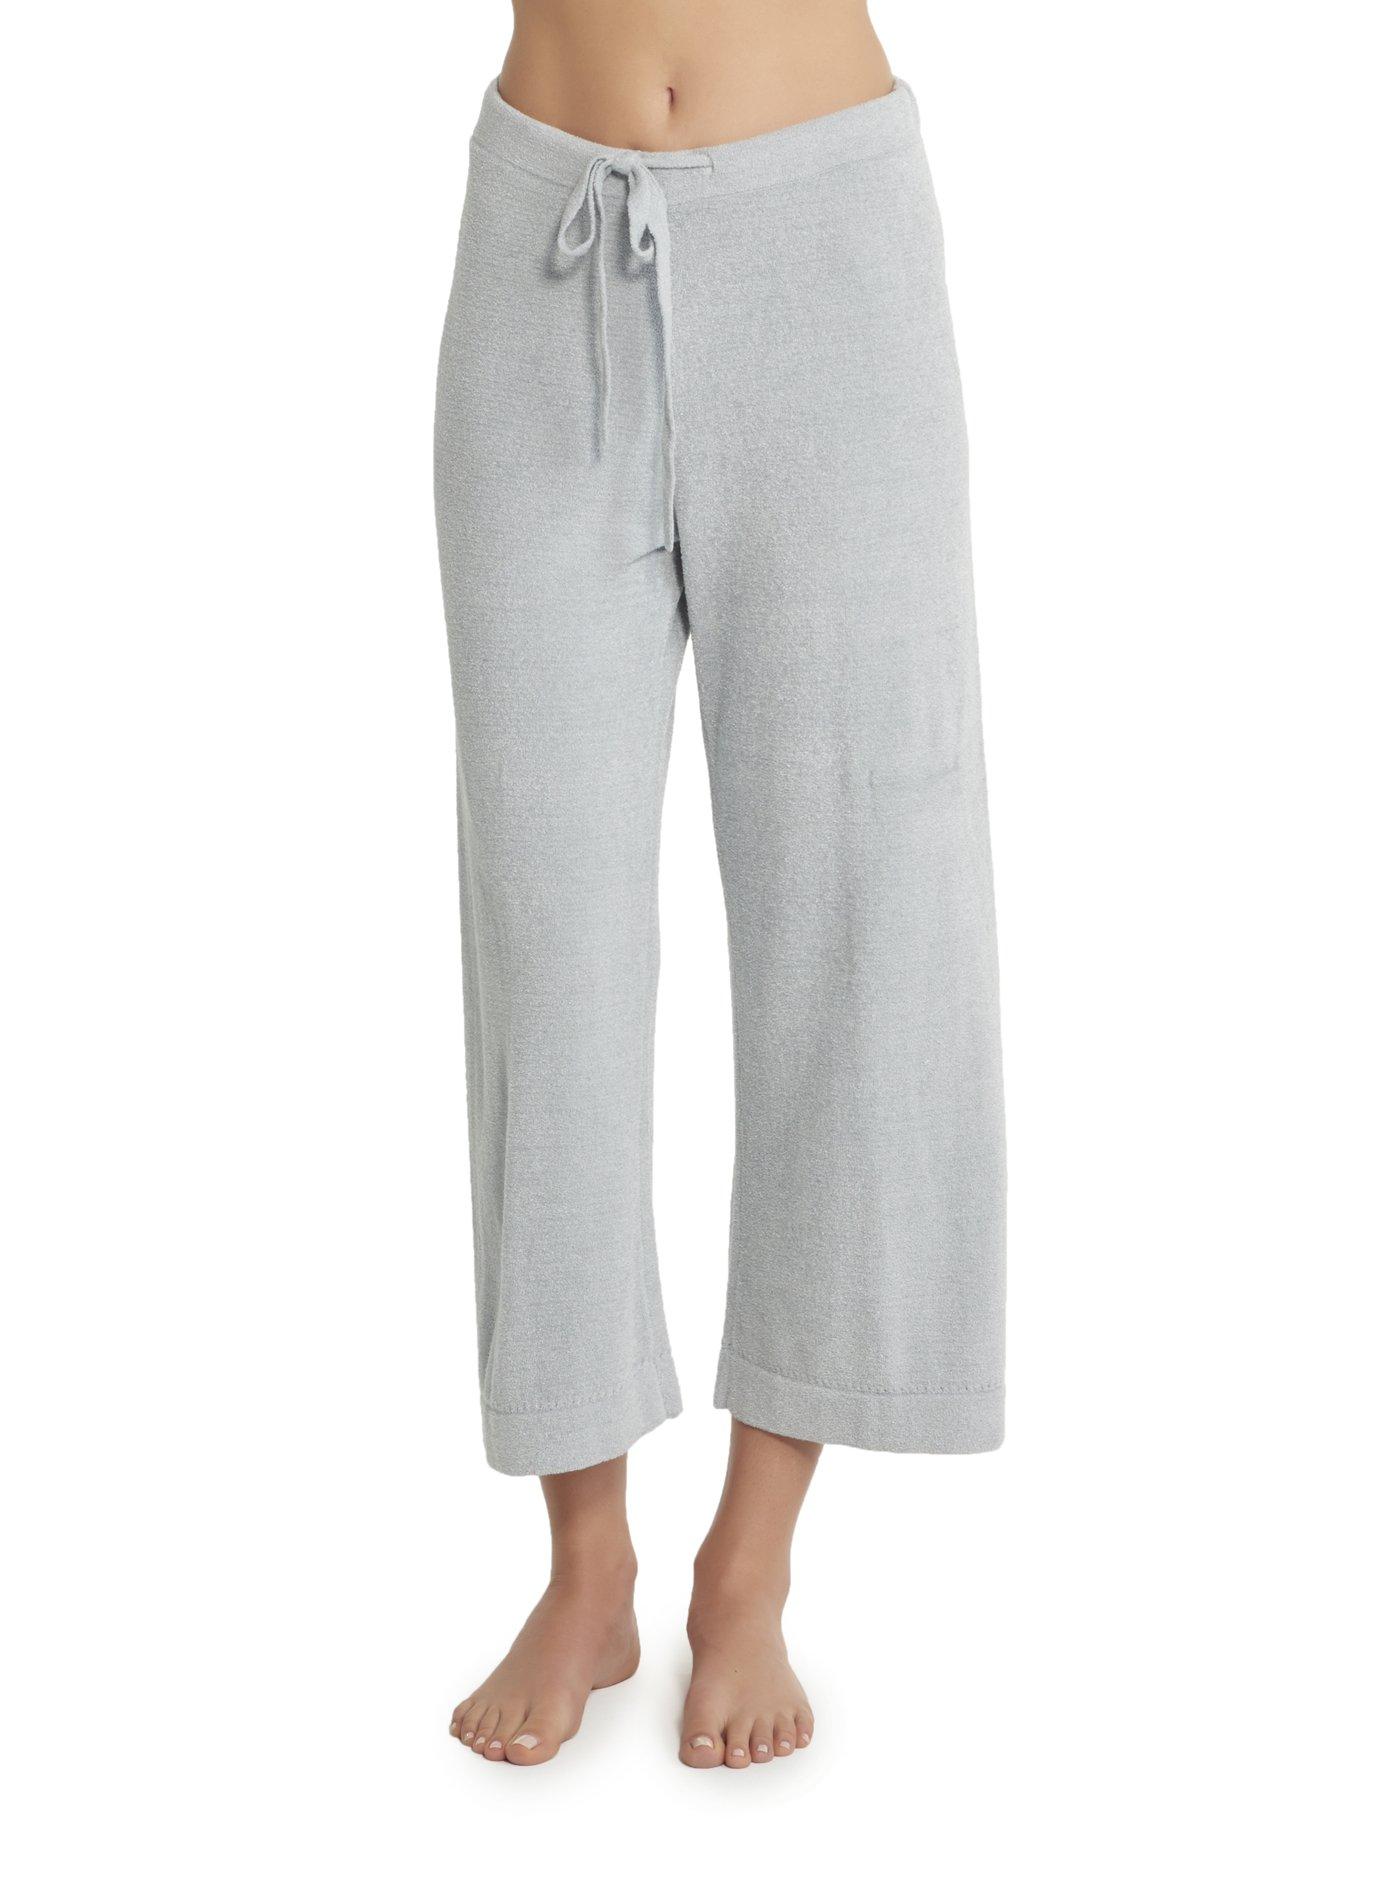 Barefoot Dreams CozyChic Ultra Lite Culotte Capri Pants